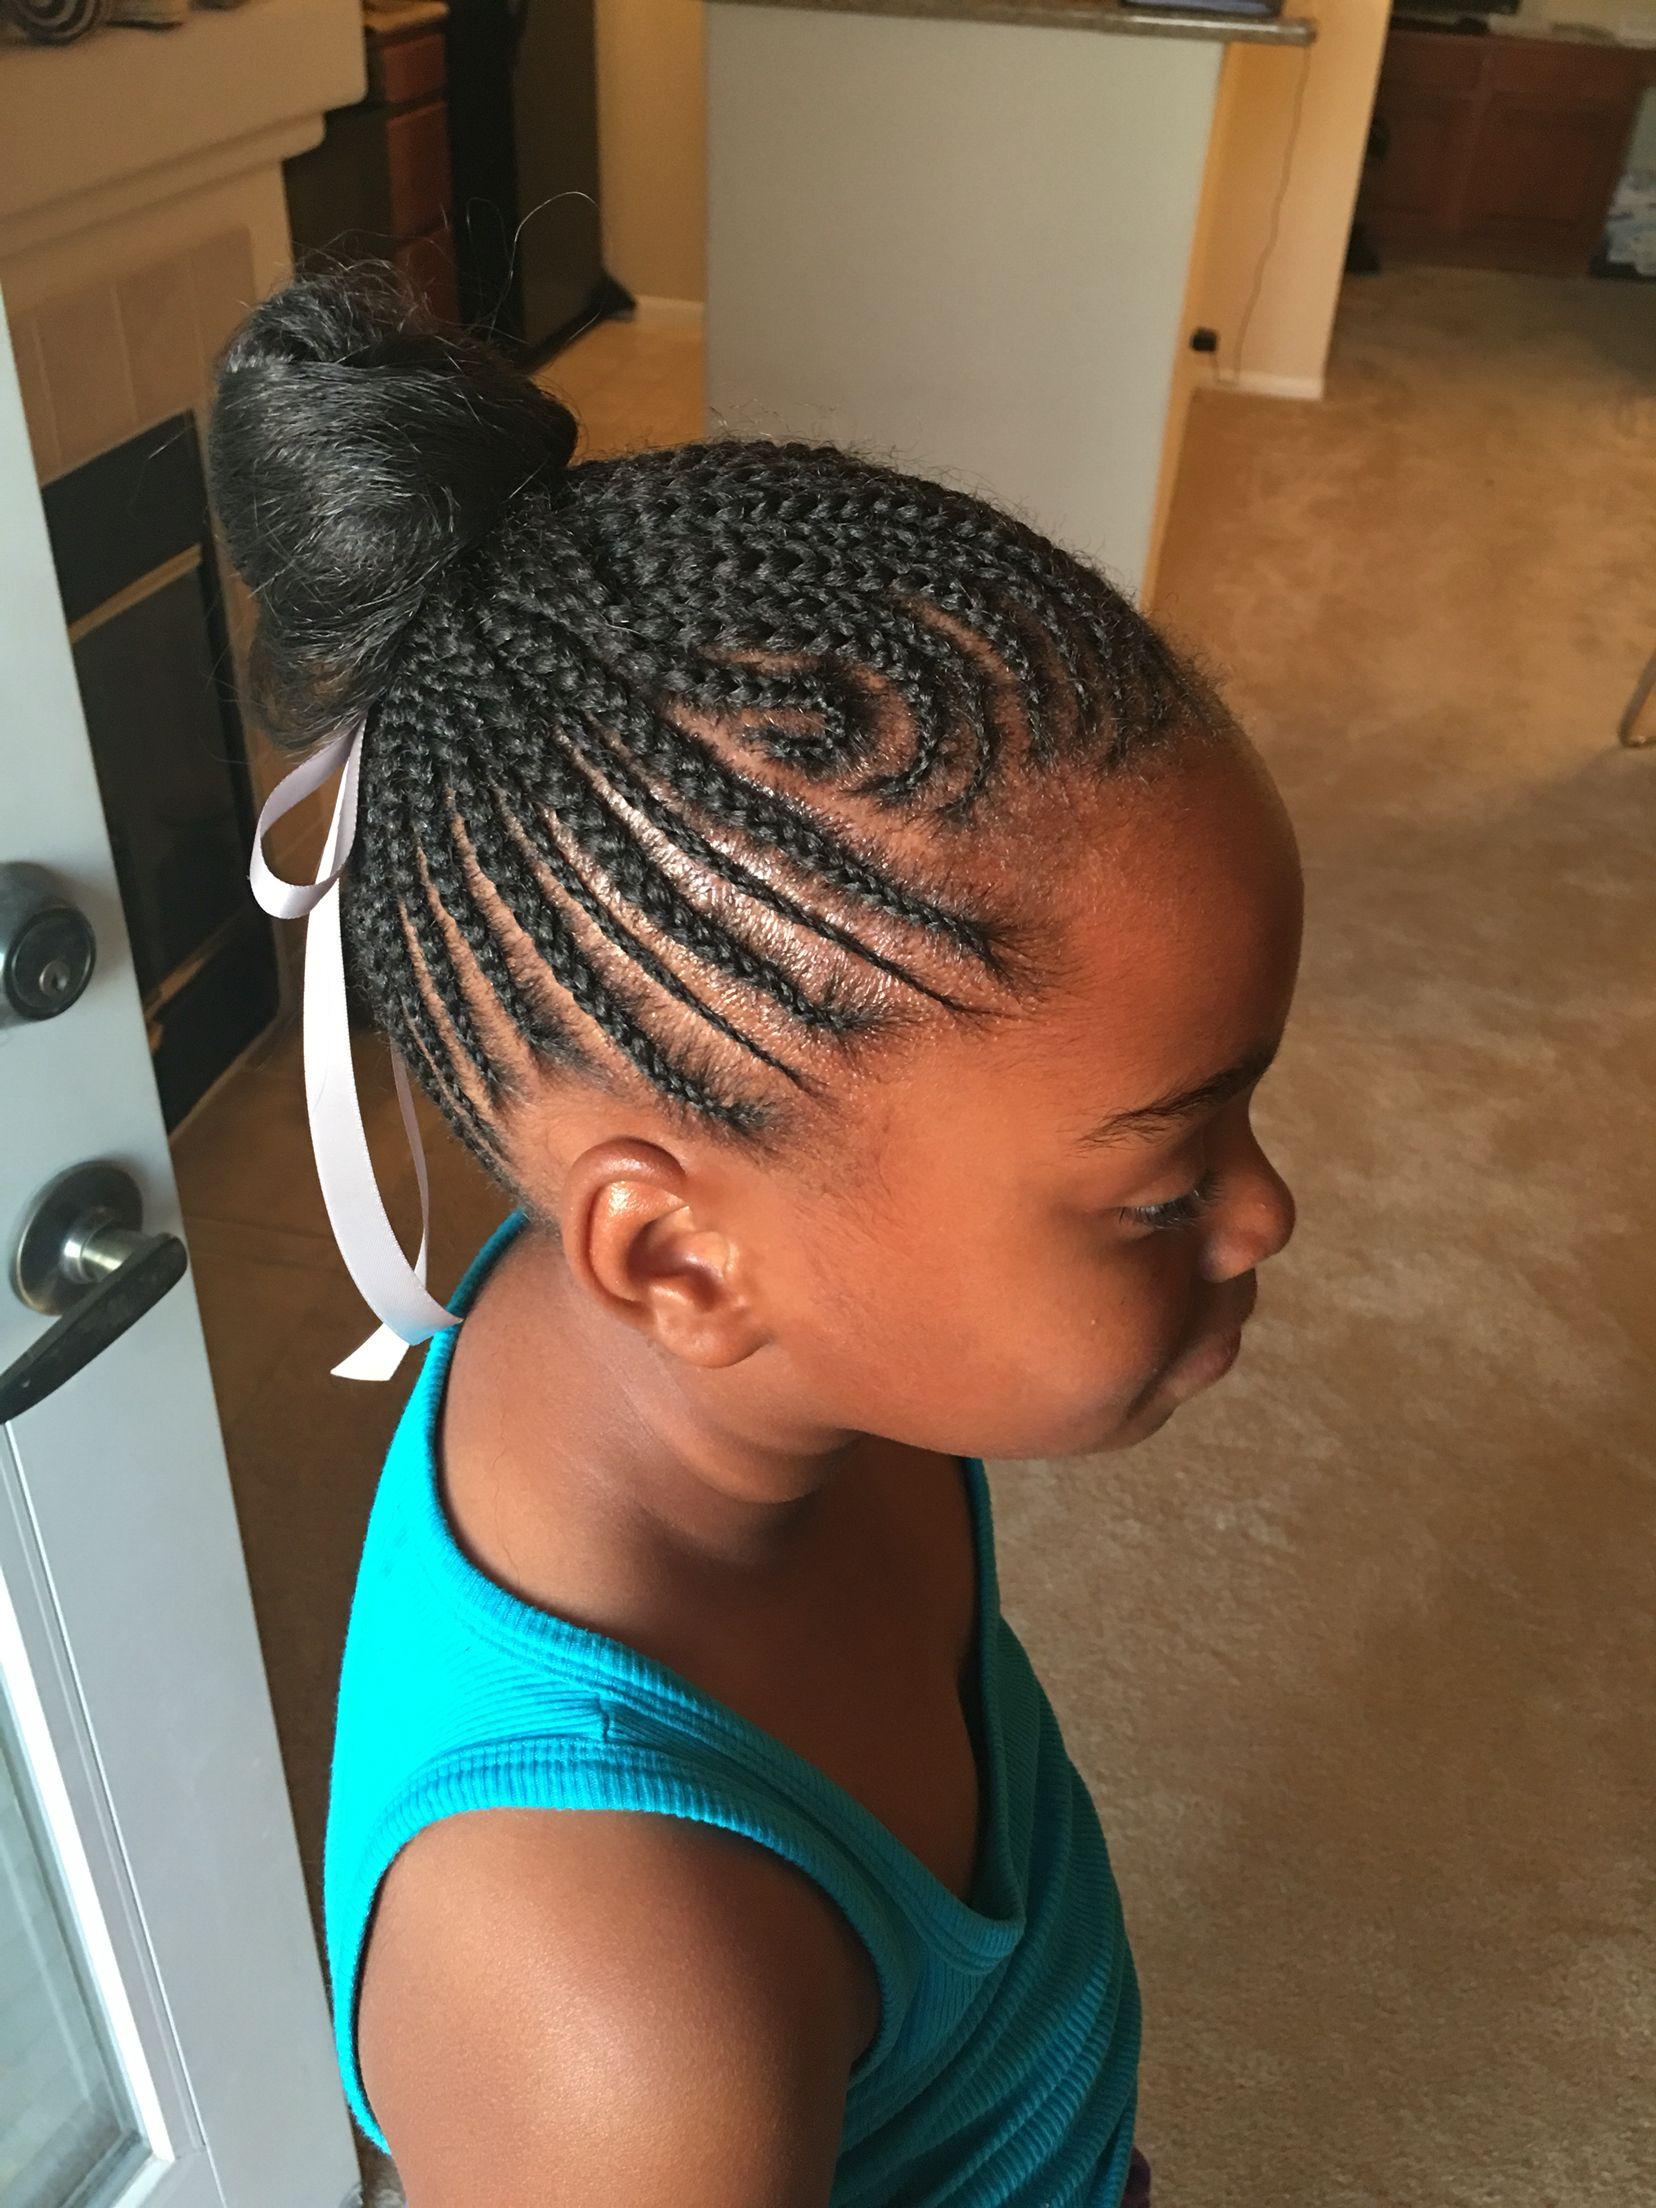 Little Braid Big Breed, Cornrows, Little Black Girl Hair, Updo, African